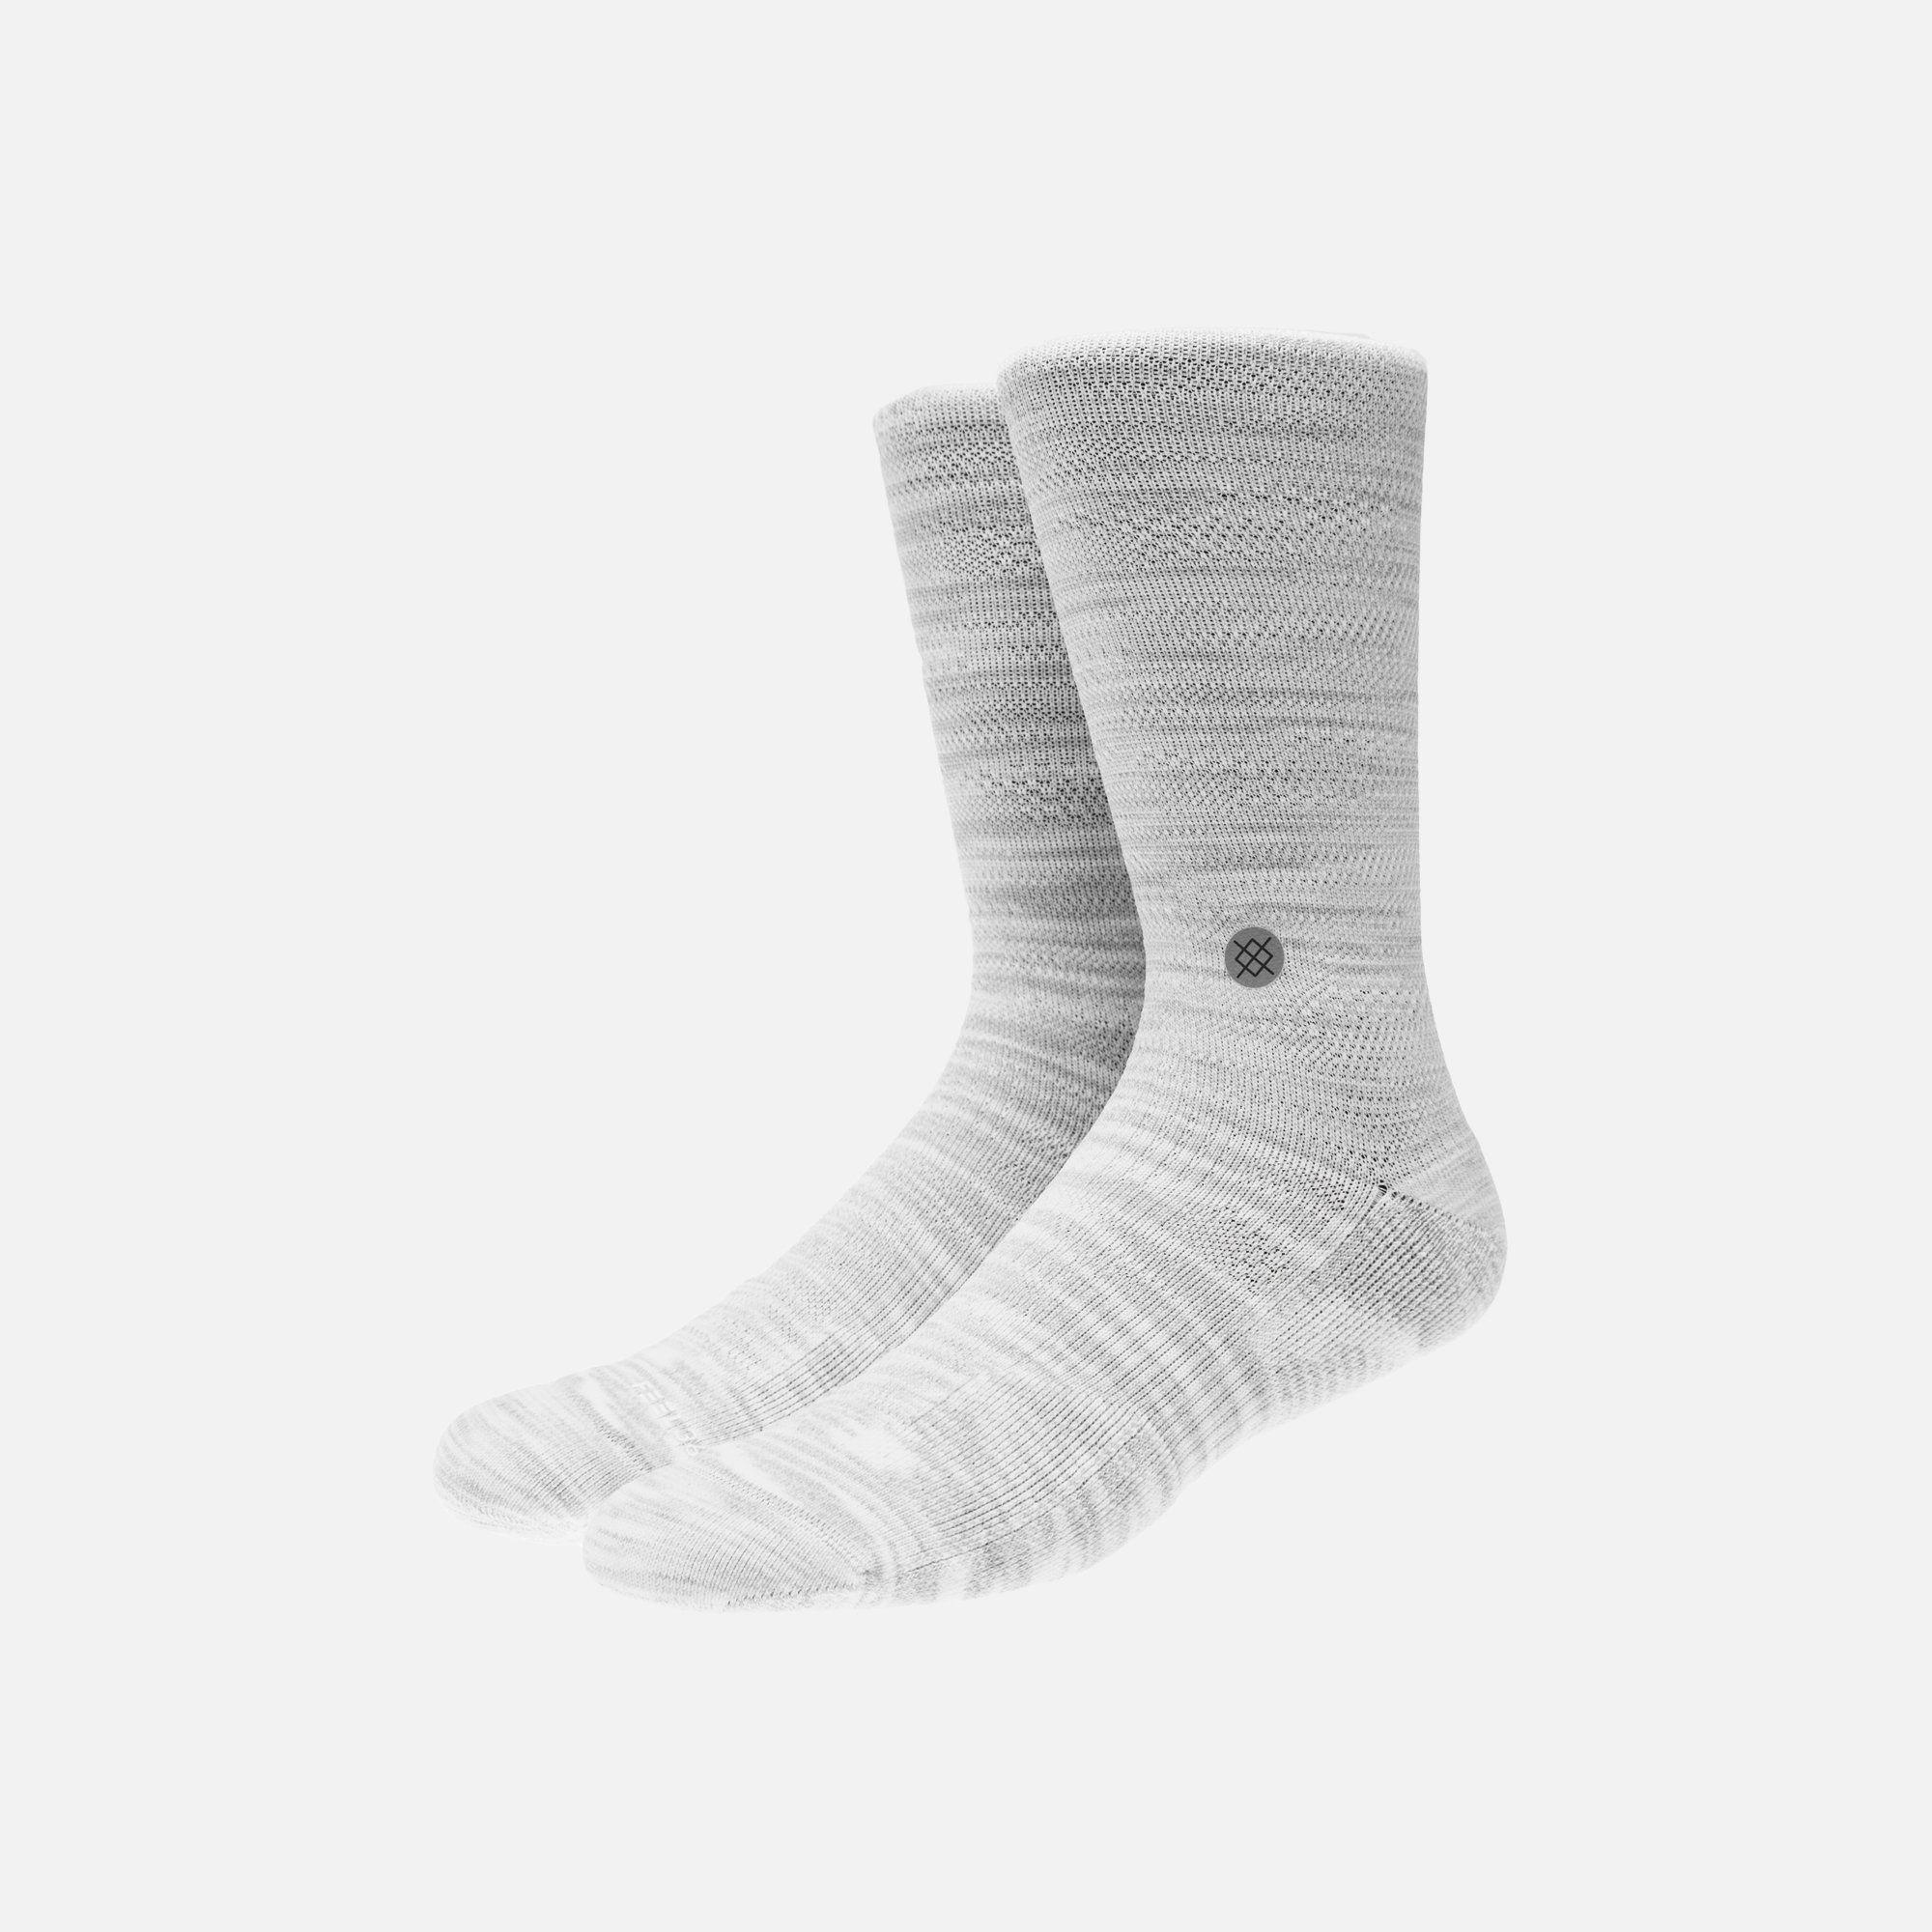 Kith x Stance Ventron Crew Sock - White  50cbc6bd262